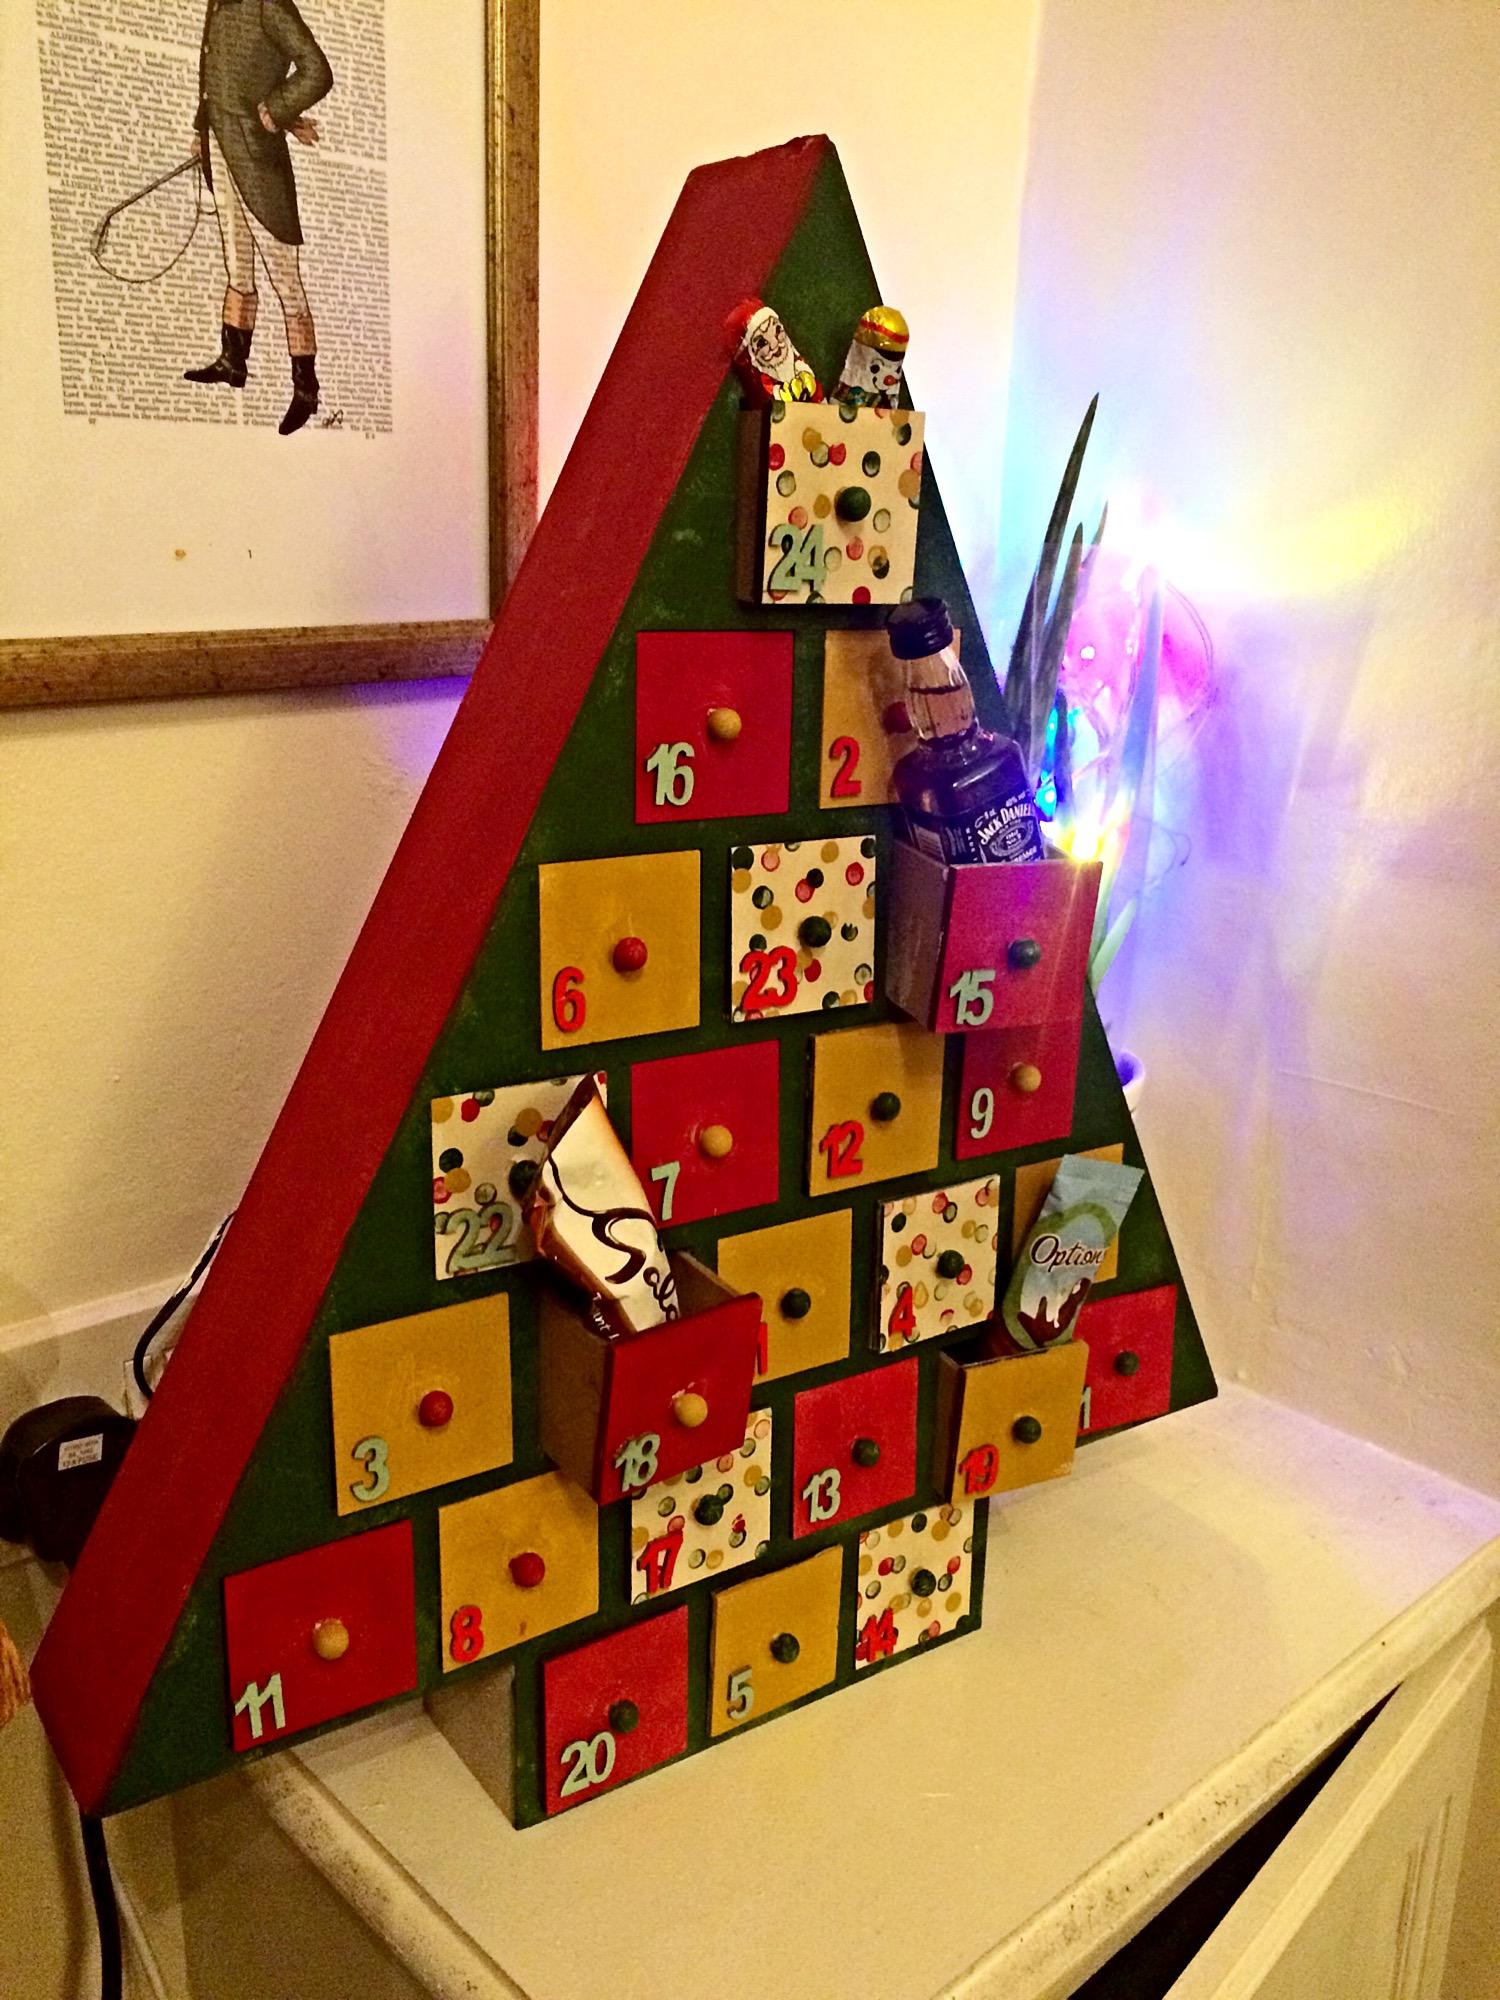 Diy Advent Calendar Project With Hobbycraft Suggestive